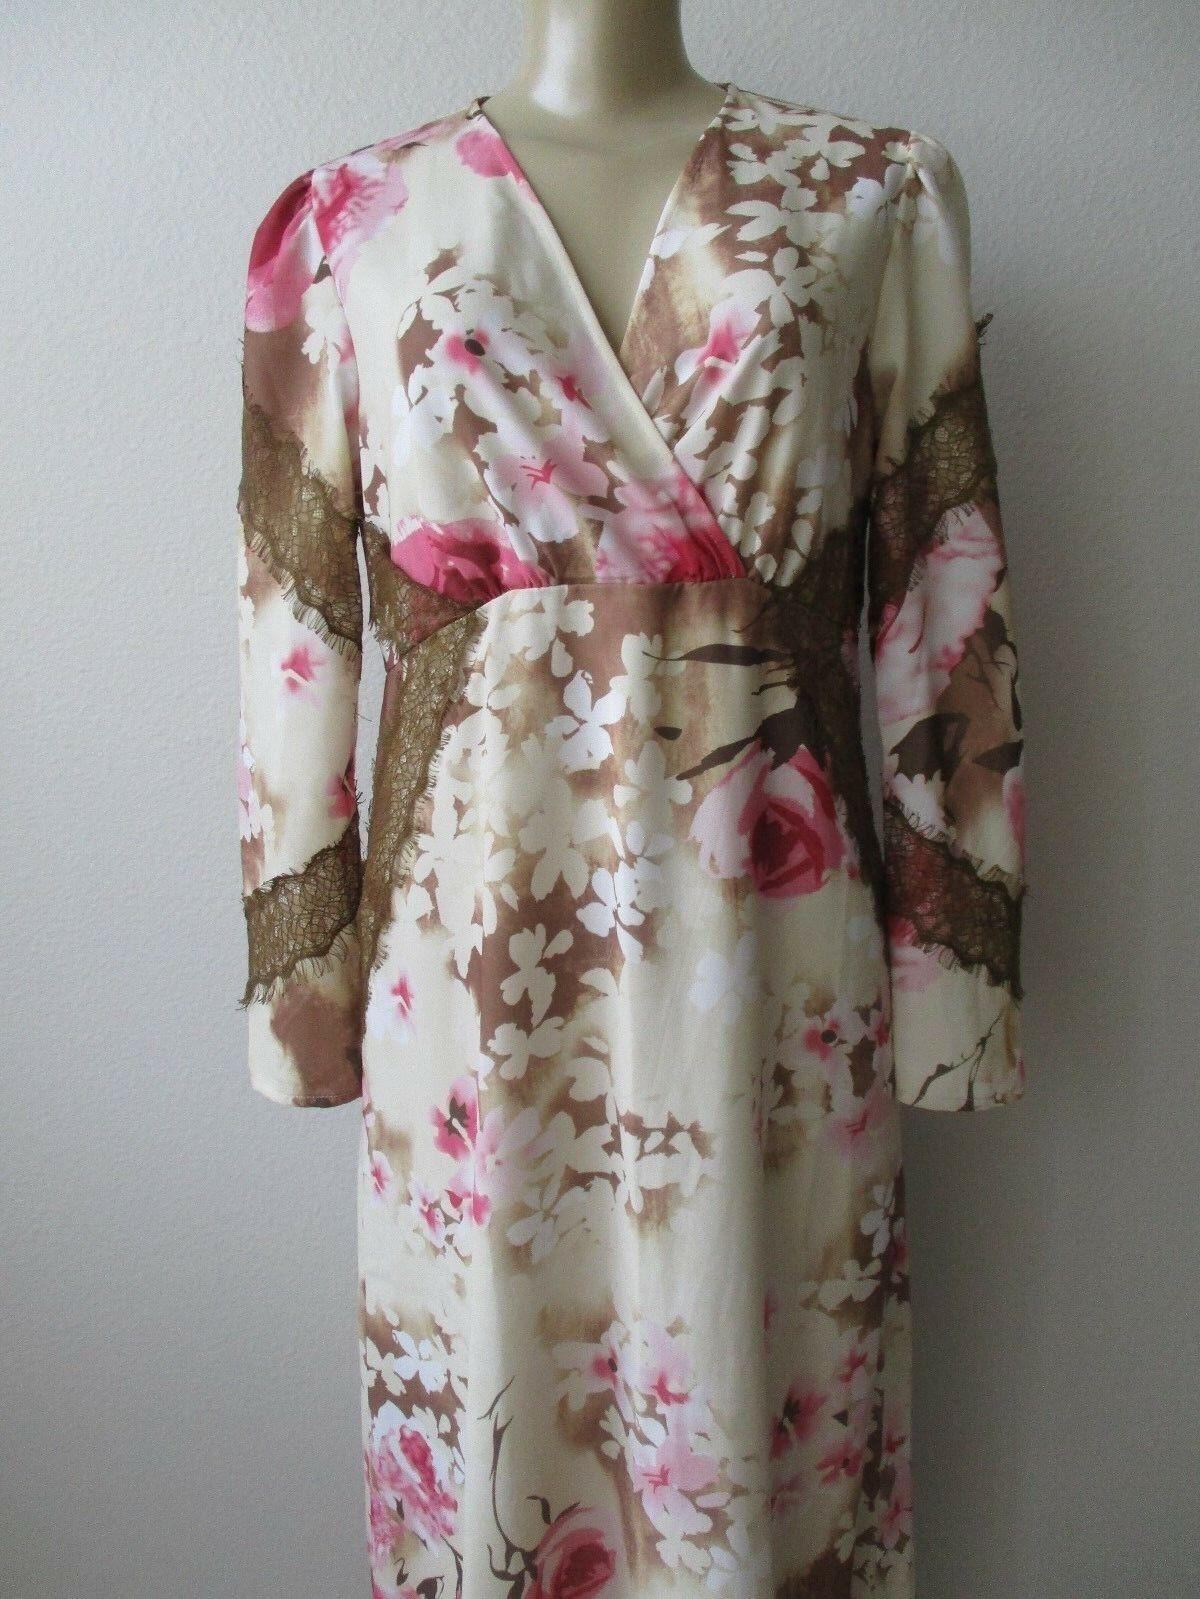 LA BELLUM BY HILLARY SCOTT FLORAL LACE MAXIE LONG DRESS SIZE 4 - NWT